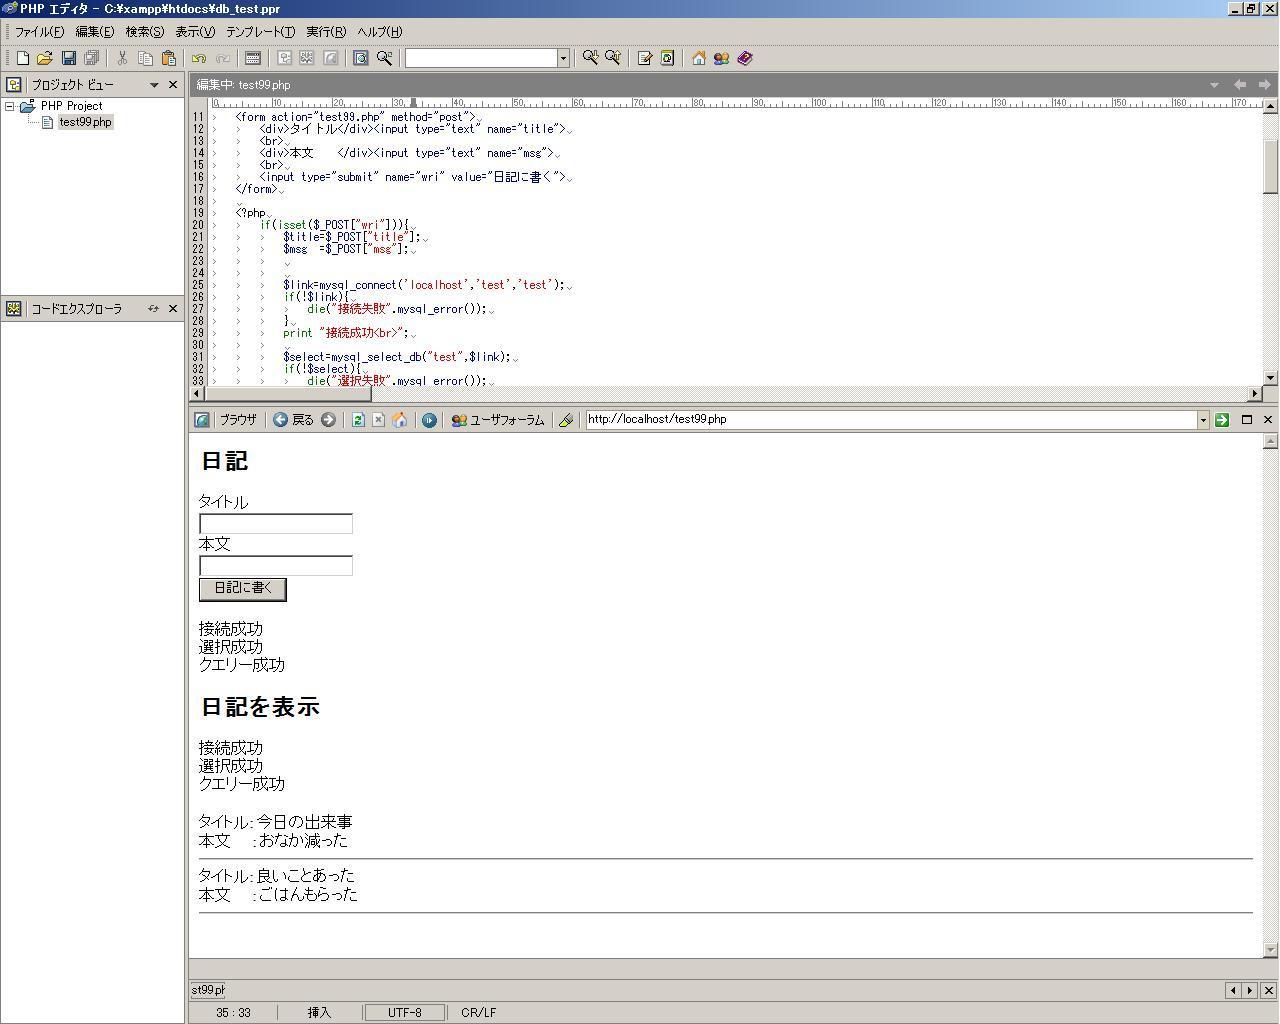 PHPでweb日記を作成 [XAMPP,MySQ...